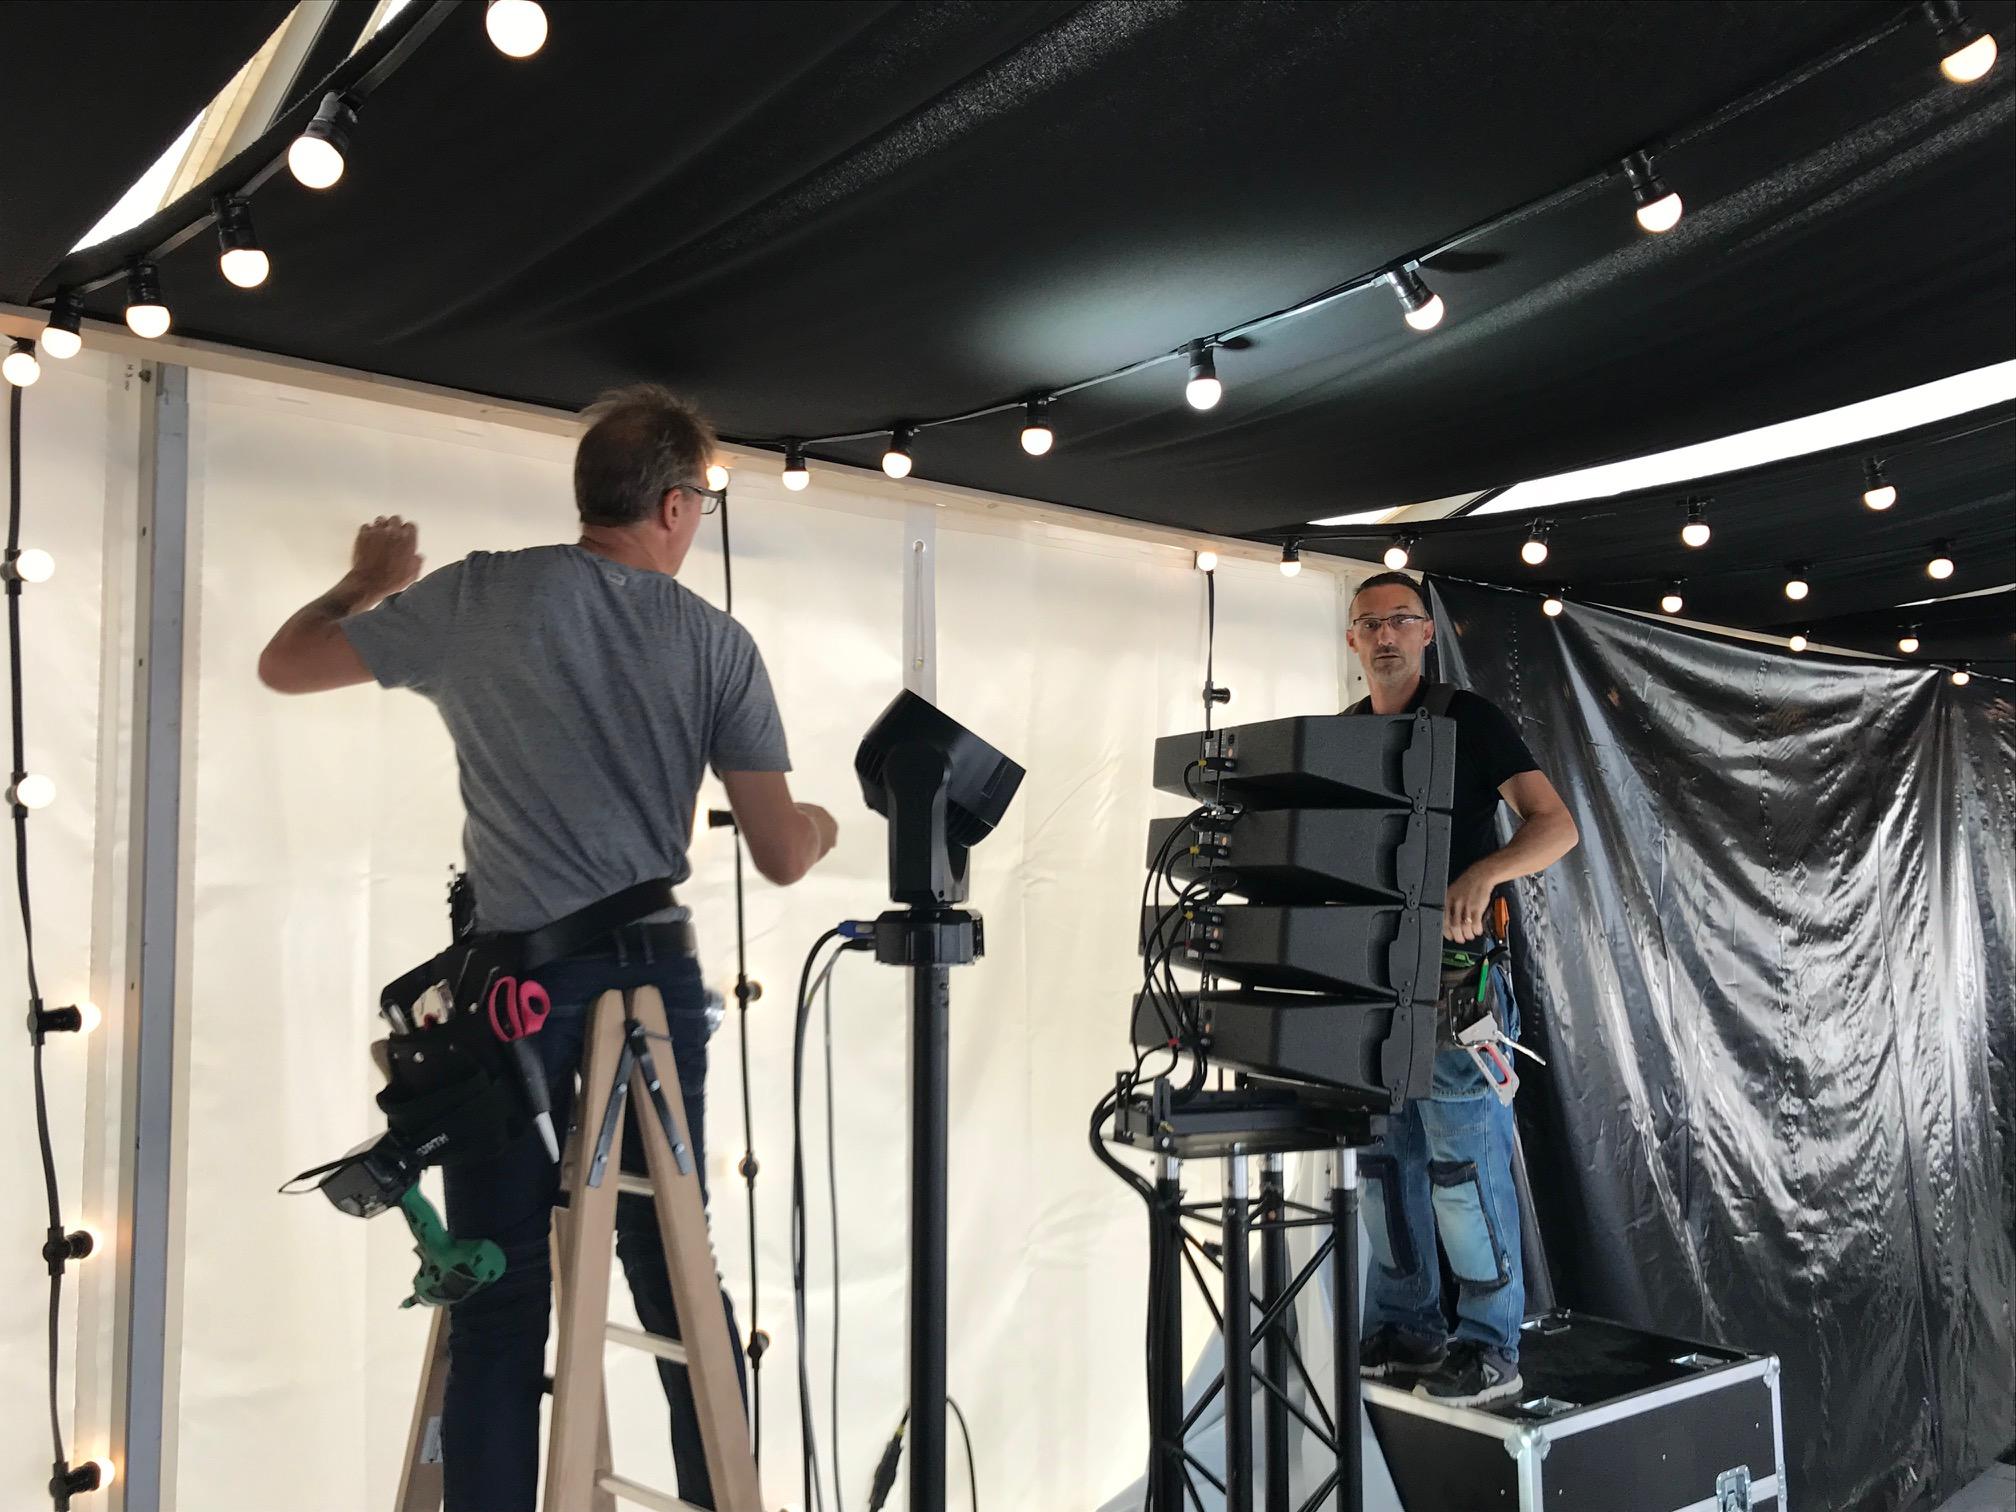 aucop-event-ikebana-abbaye de valasse-evenement-son-eclairage-deco-wissous-audiovisuel-carros